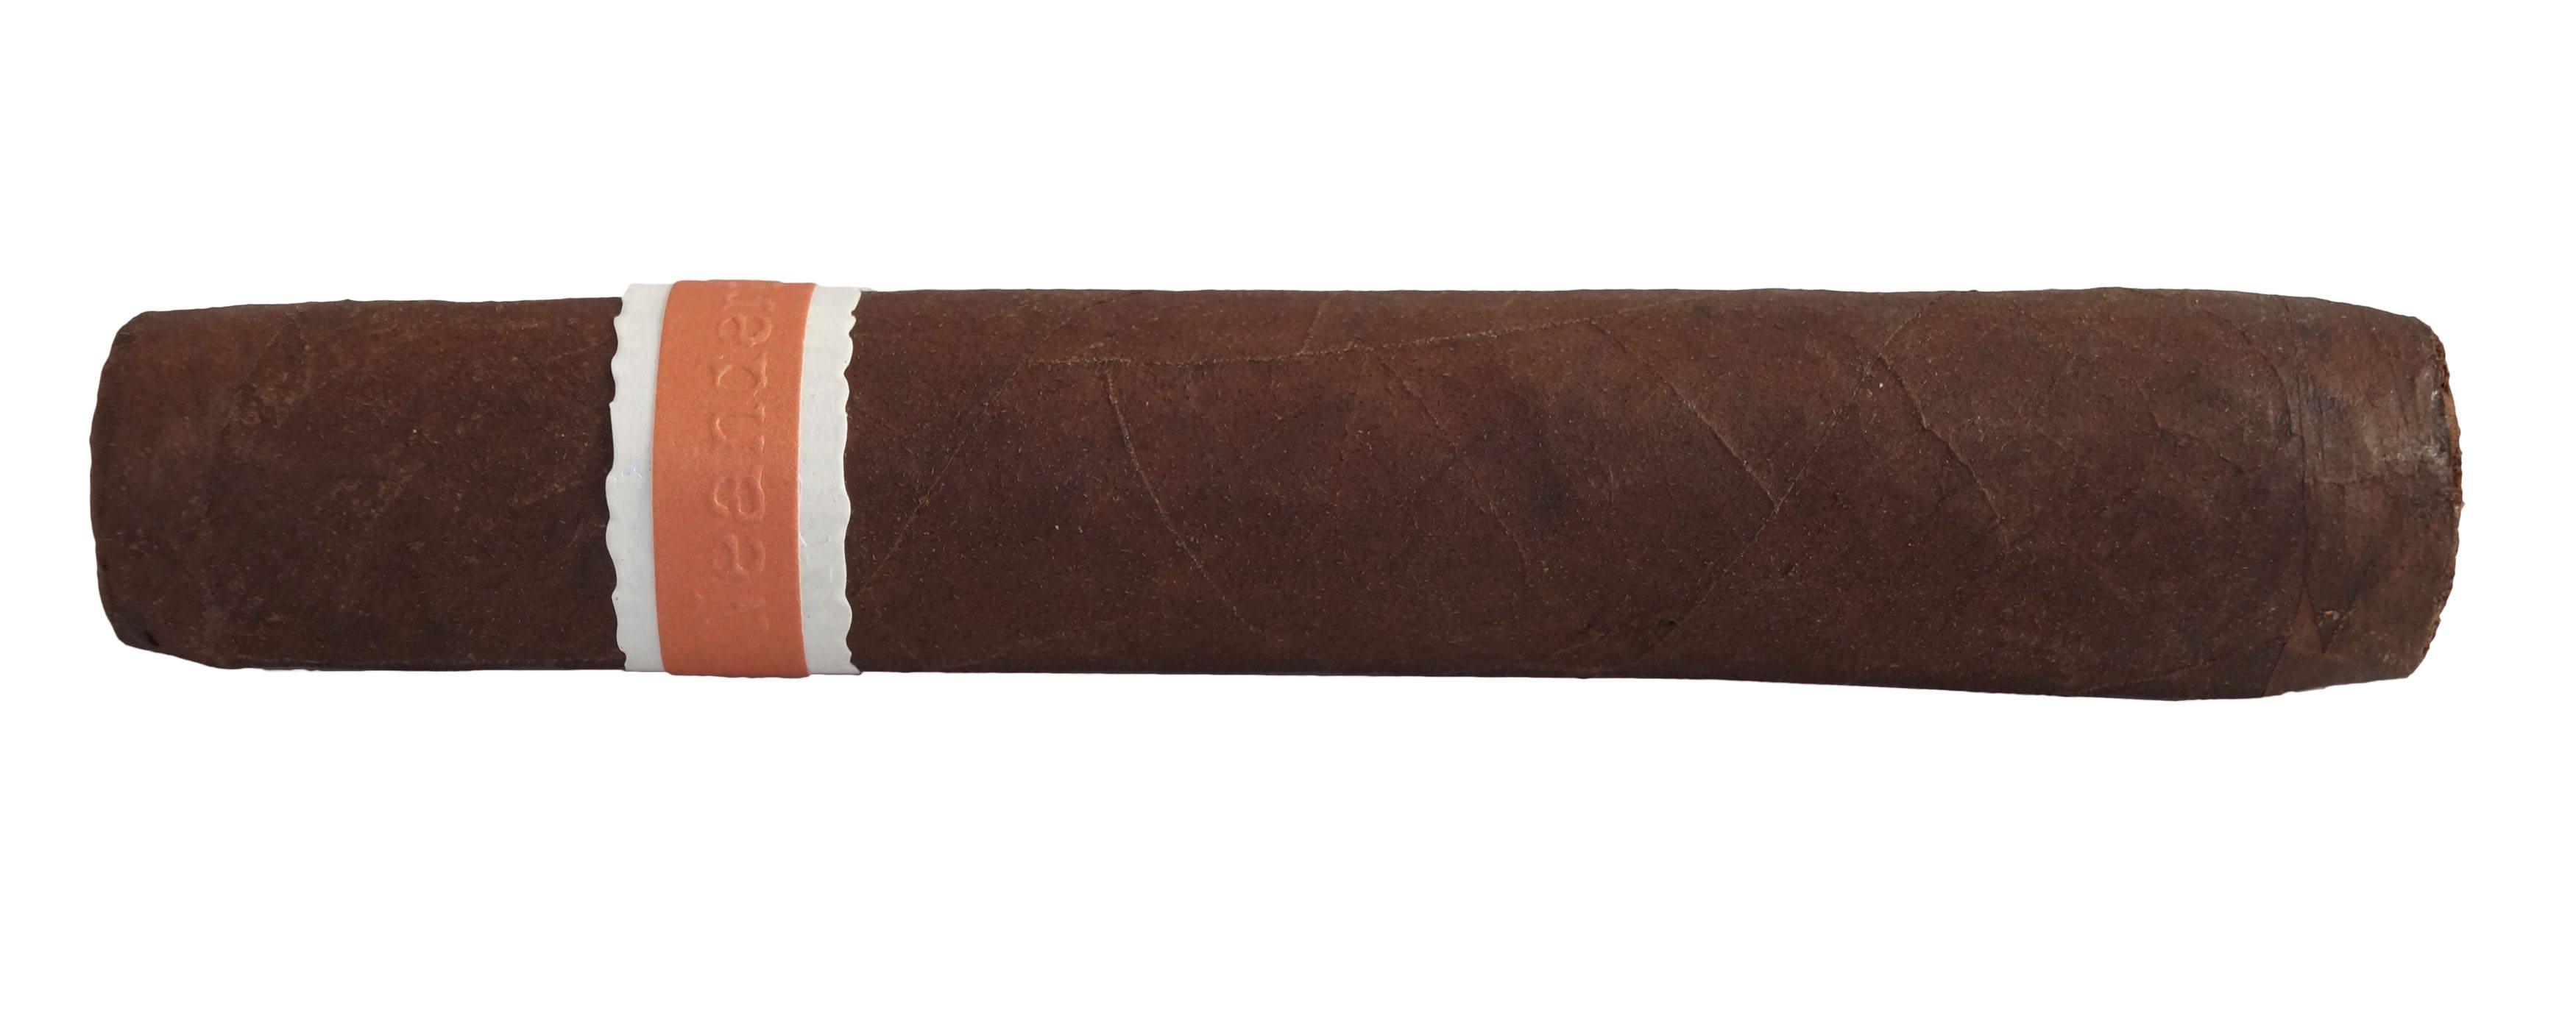 Blind Cigar Review: RoMa Craft | Neanderthal HN